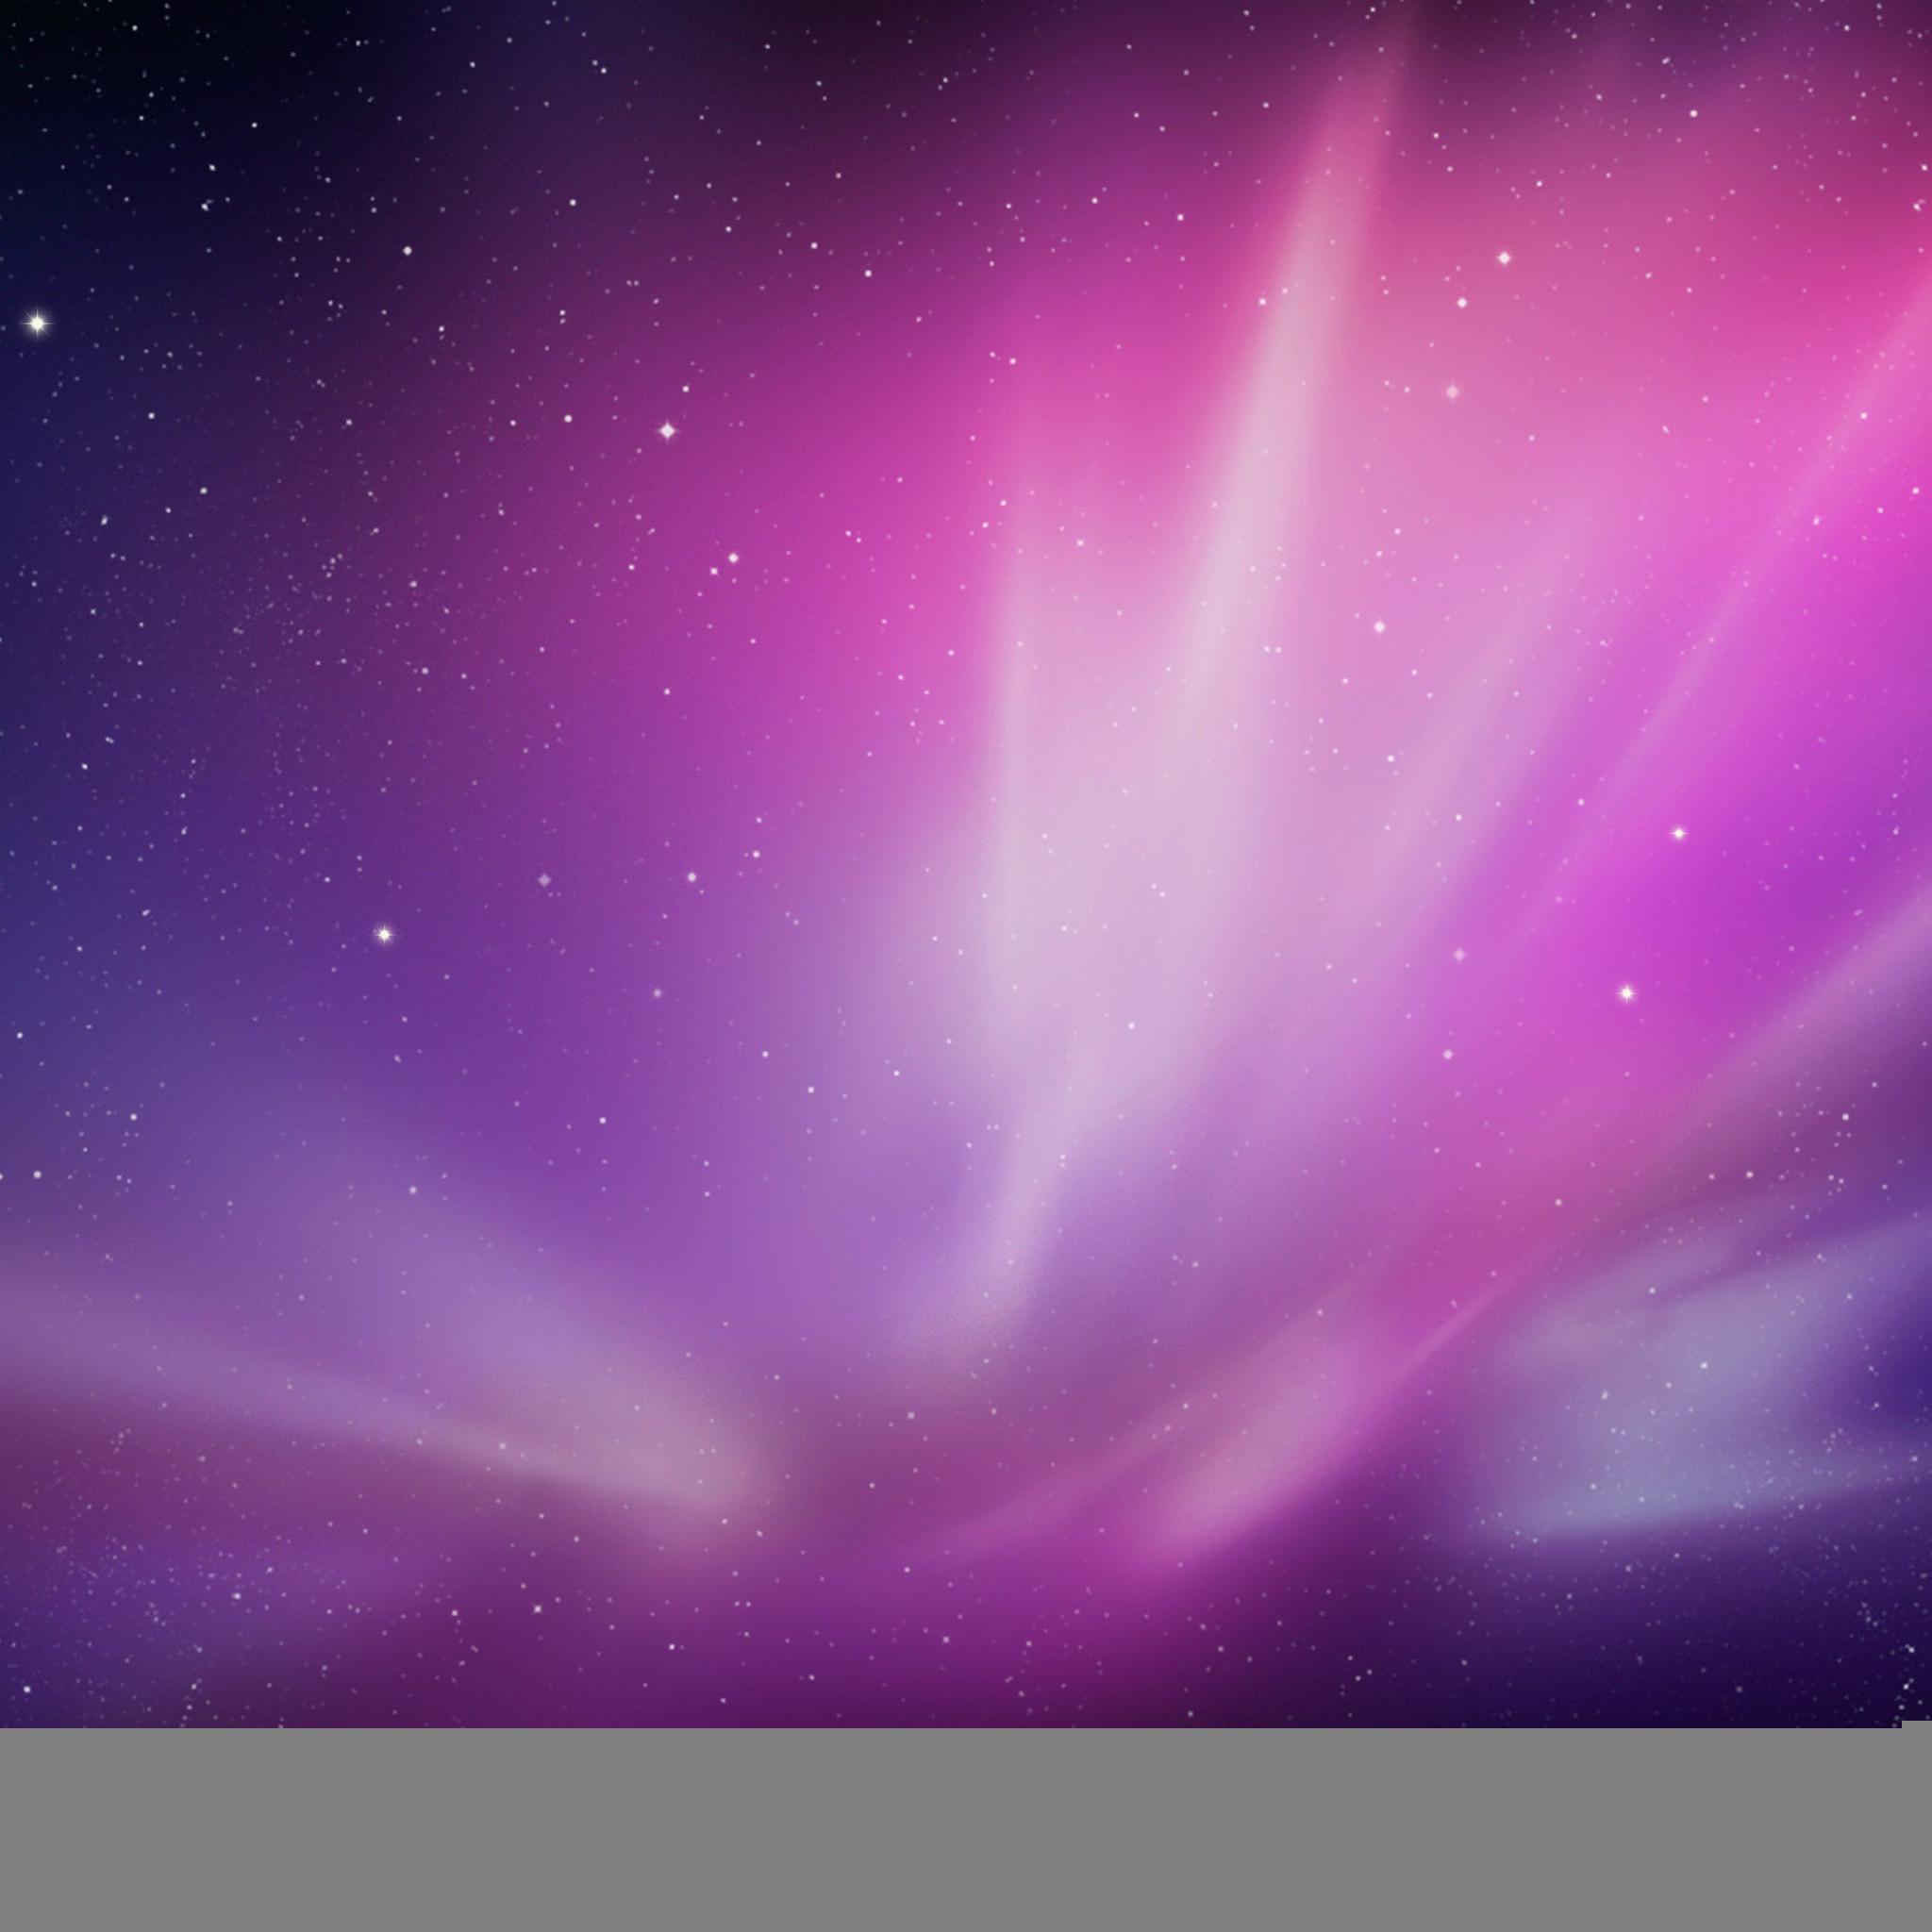 1722 1: Fantasy Purple Red Shiny Nebula Space View iPad Air wallpaper